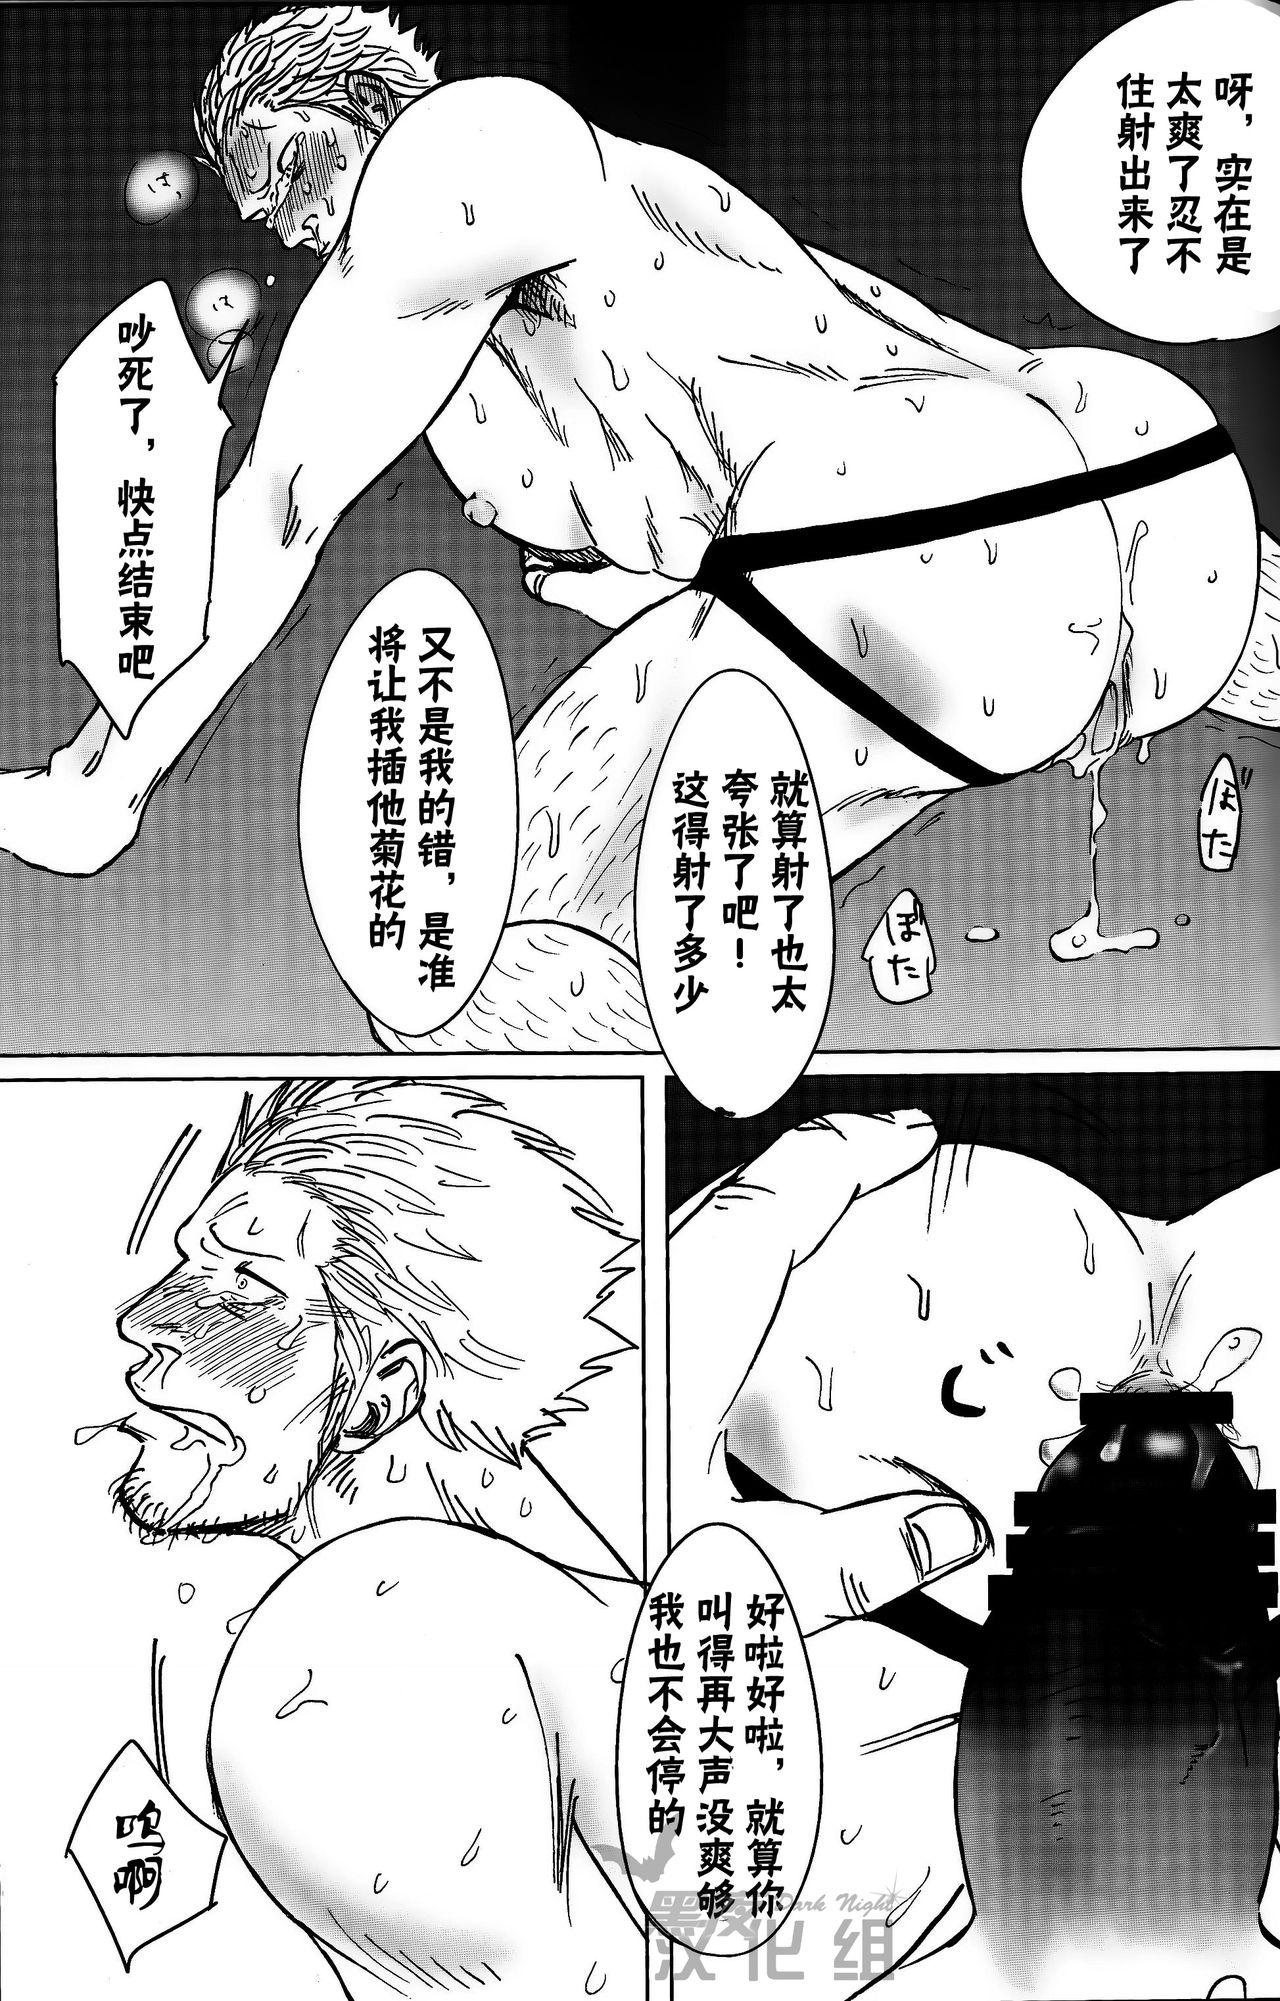 (C82) [Chikuwamome (Ishikawa)] Kemuri Rinkan ~Sin G-5~ | 煙輪x~真G5~ (One Piece) [Chinese] [黑夜汉化组] 13